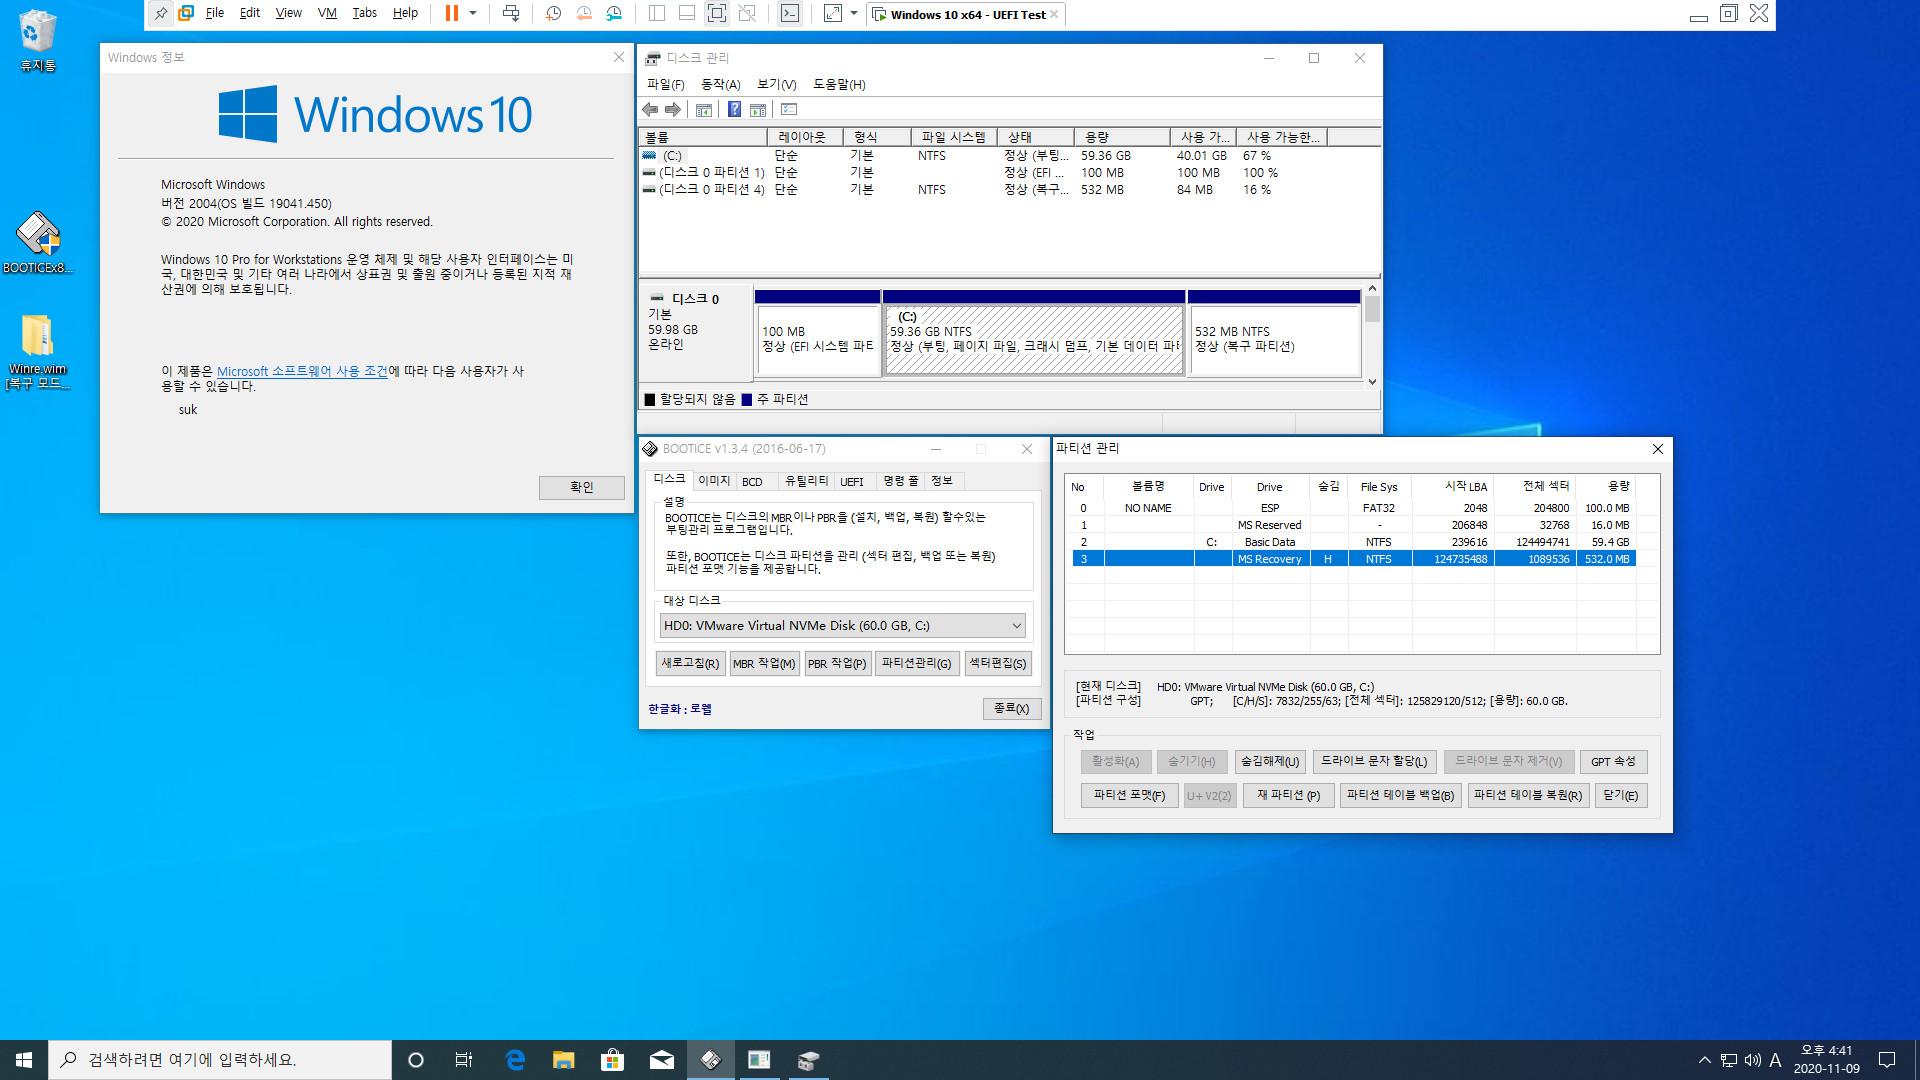 Winre.wim [복구 모드] 재구성하기 2020-11-09.bat 테스트 - PE를 winre.wim으로 사용하기 - 버전 2004 정식 UEFI 모드로 윈도우 설치해도 C드라이브에 winre.wim 복구모드가 만들어집니다-bootice가 0부터 숫자를 셉니다 2020-11-09_164152.jpg